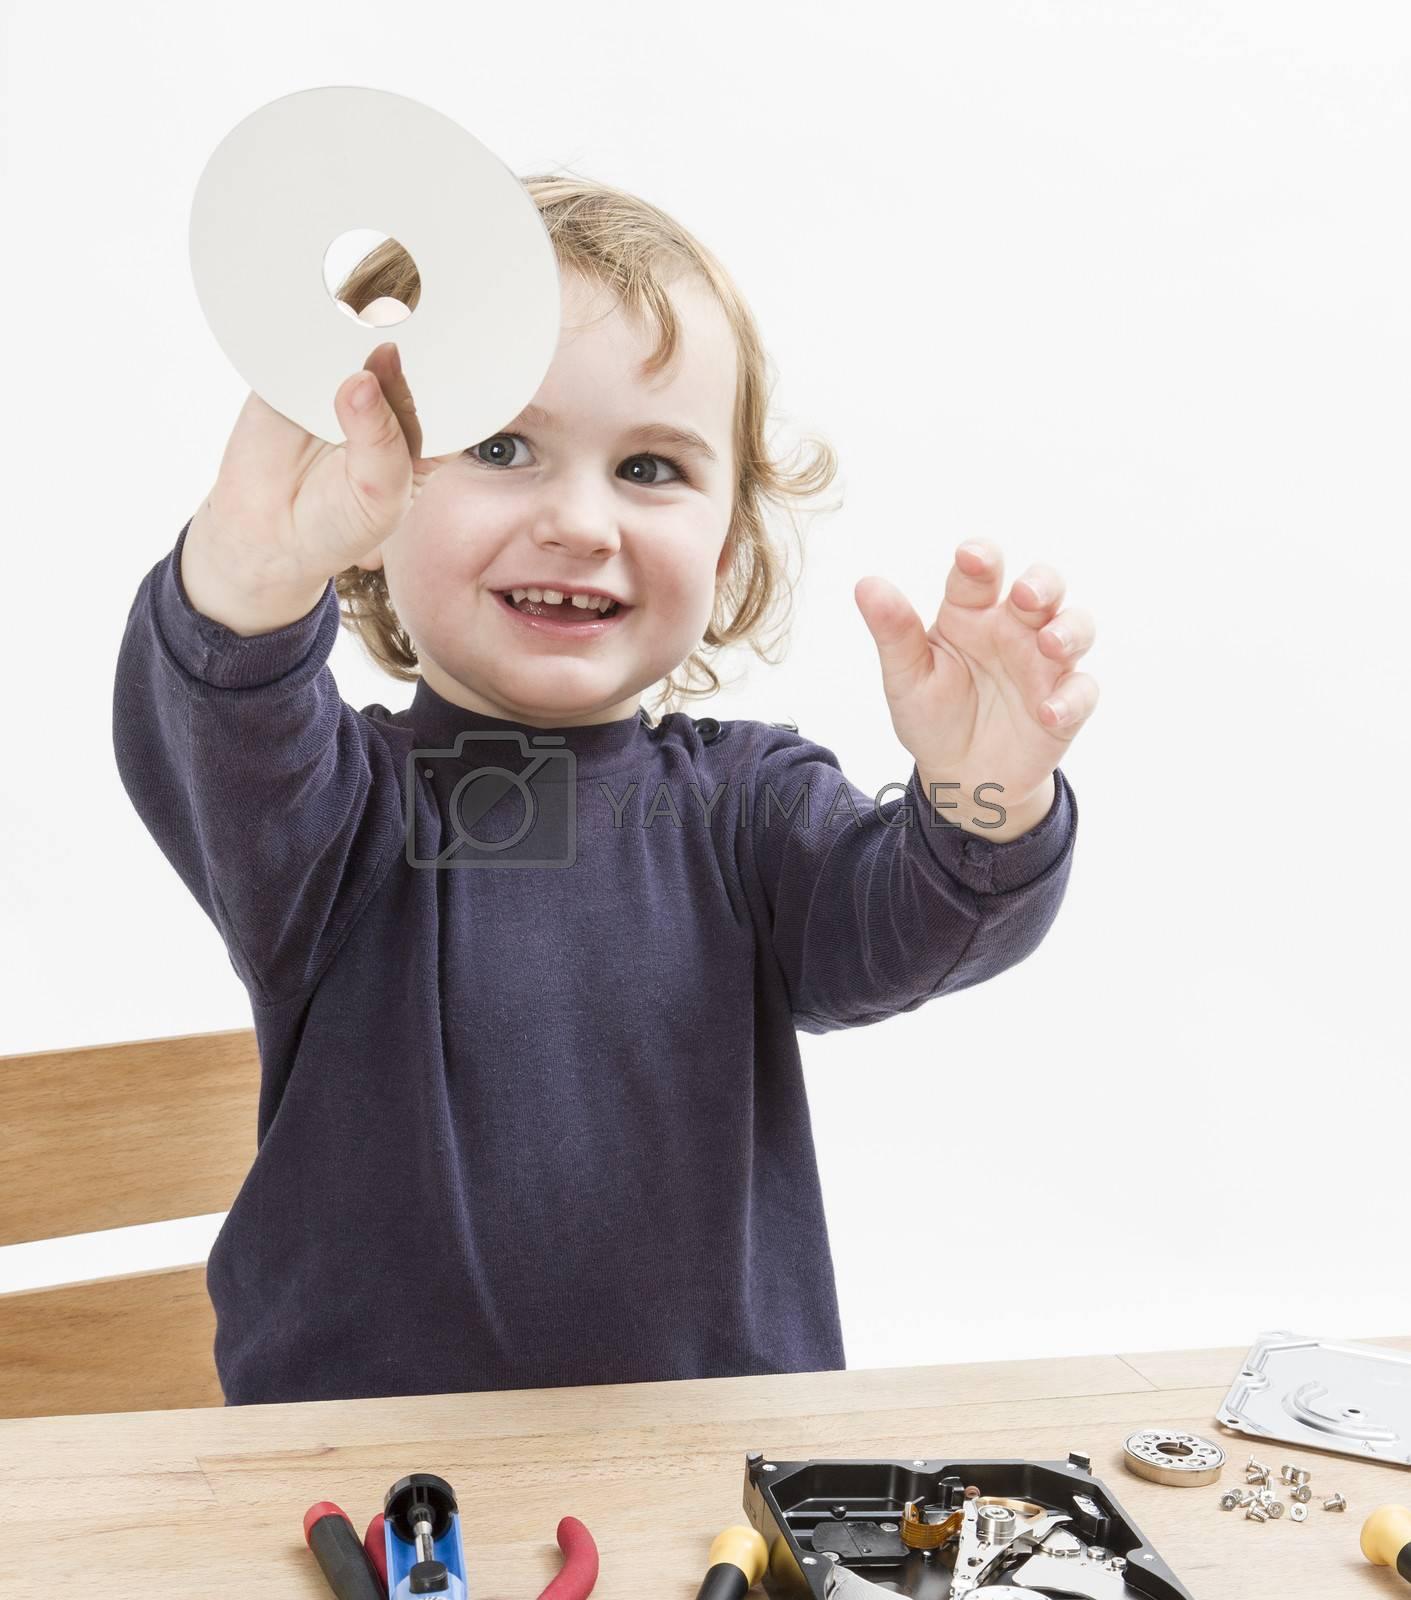 child repairing computer part. studio shot in light grey background